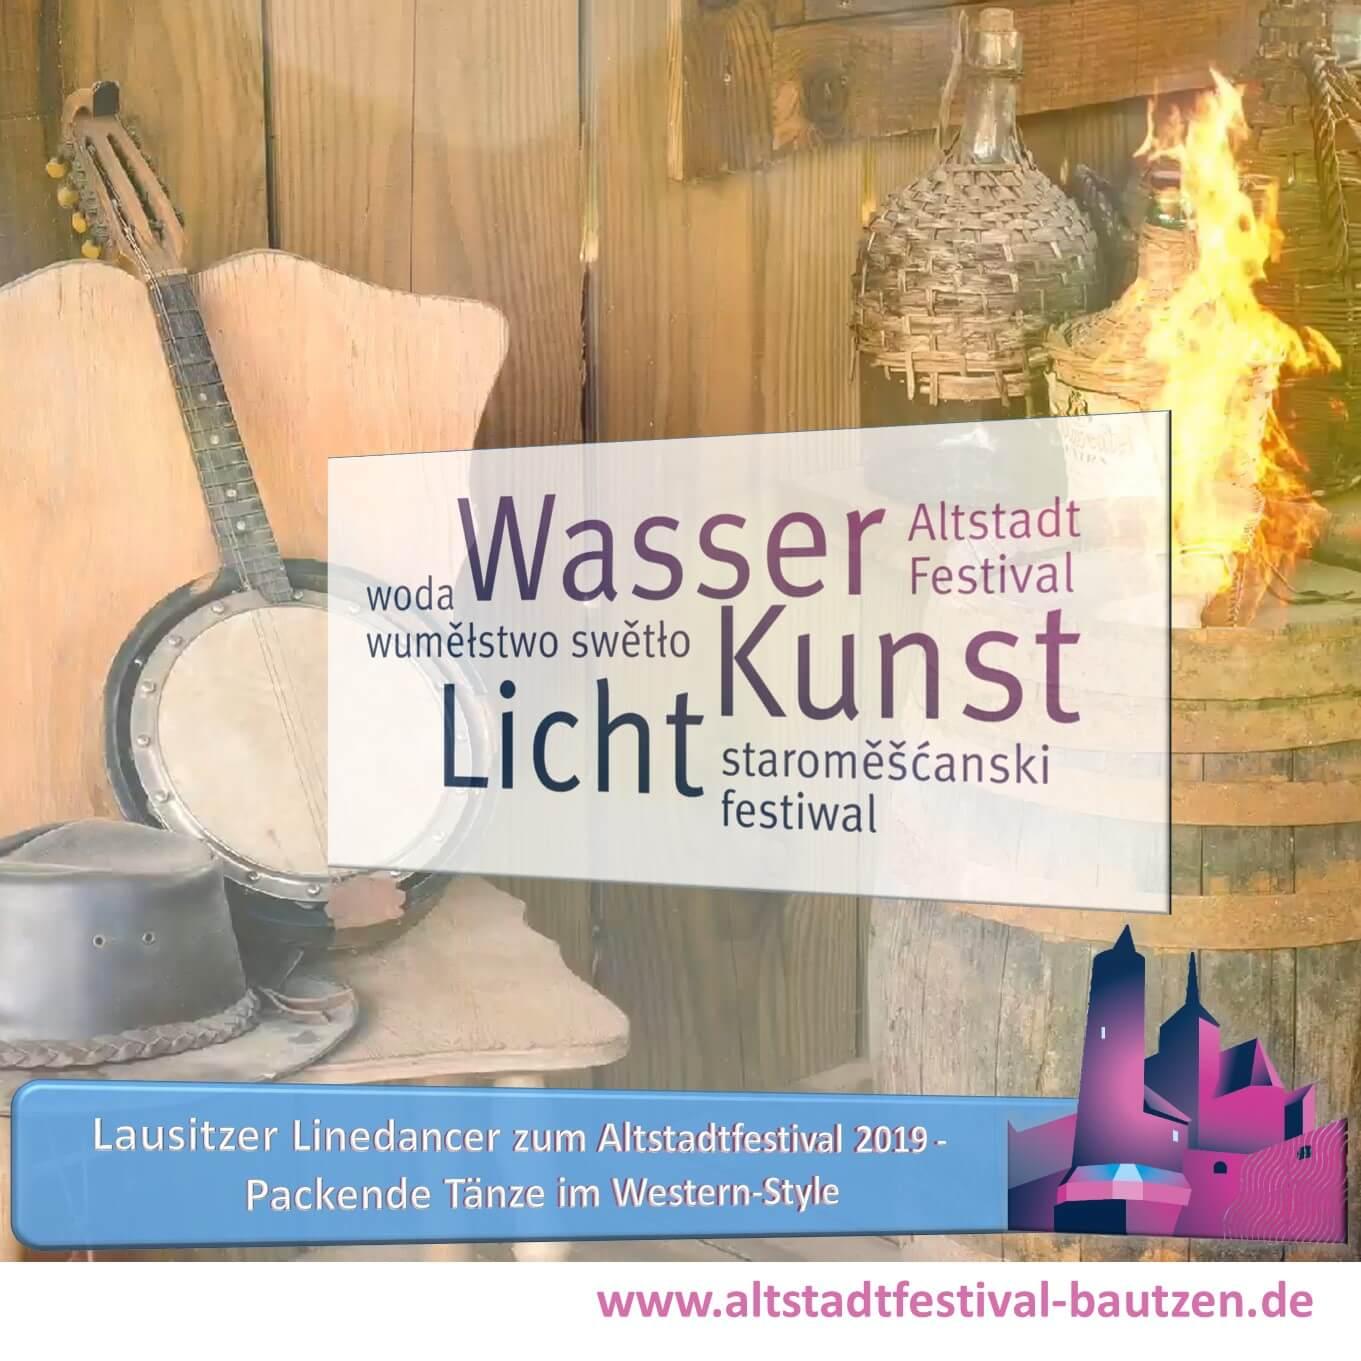 Beitrag Lausitzer Linedancer zum Altstadtfestival 2019